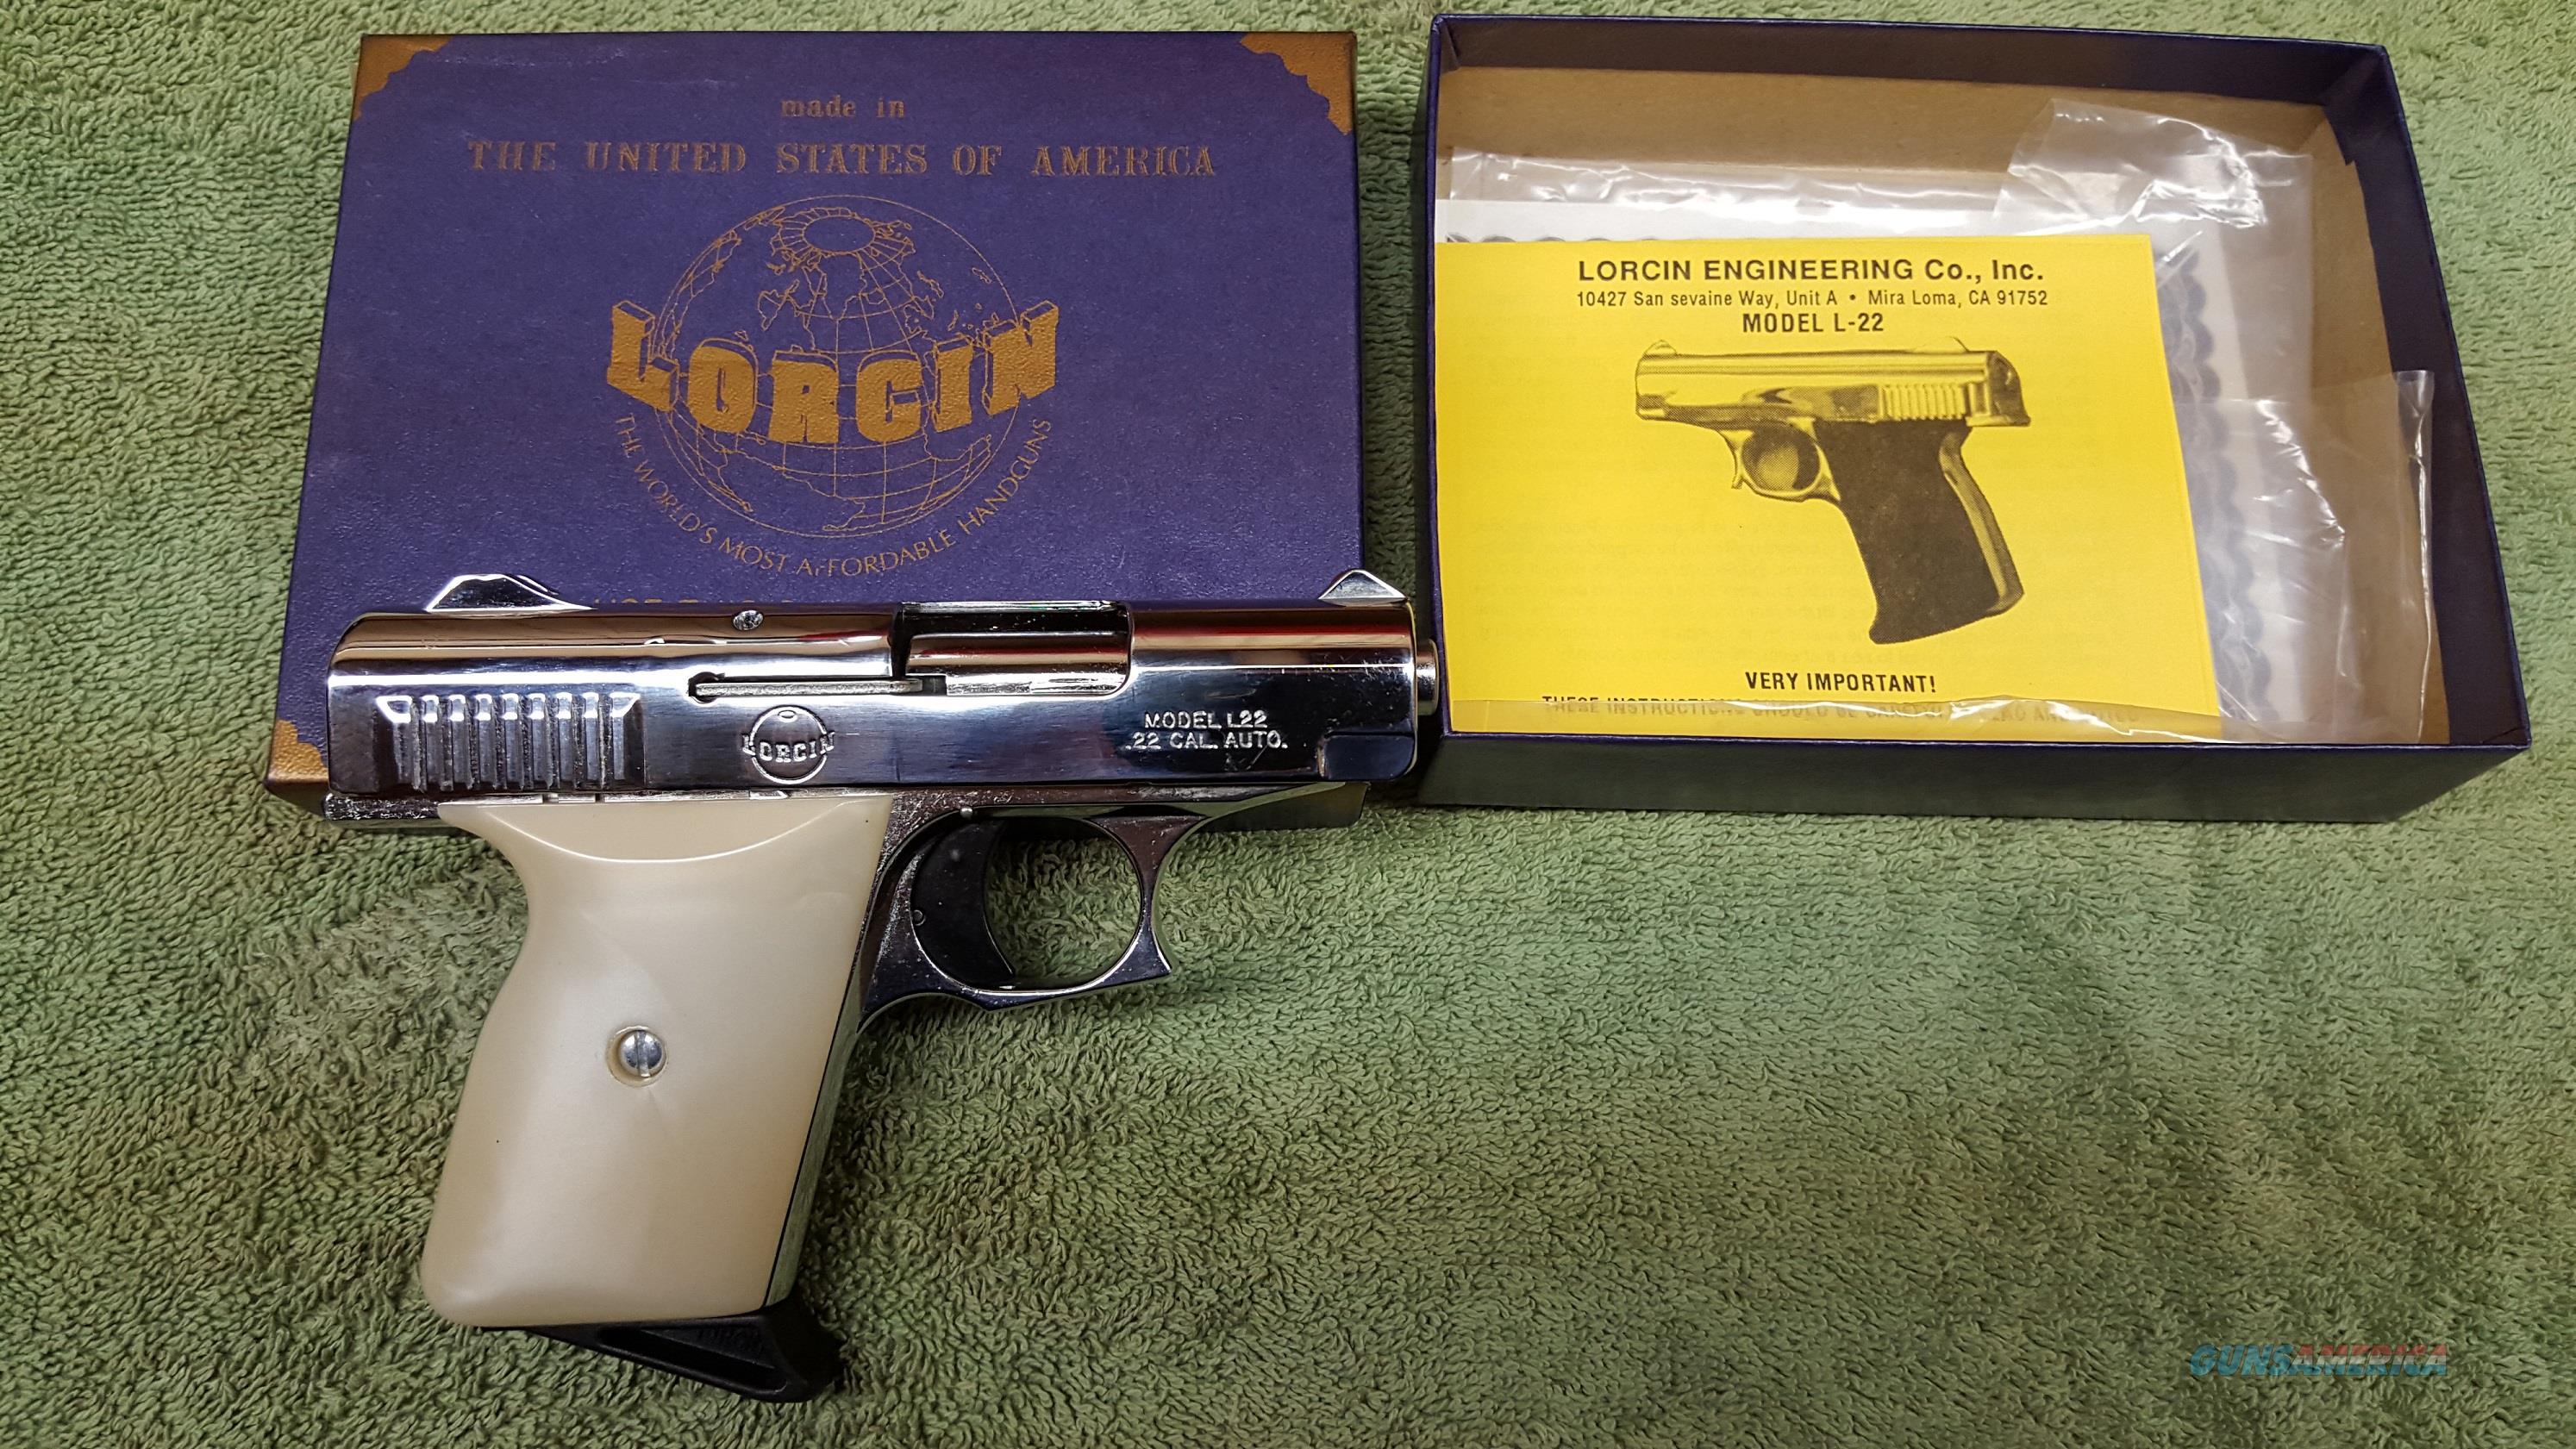 NIB lorcin L-22 Semi-auto .22 LR Pistol  Guns > Pistols > Lorcin Pistols